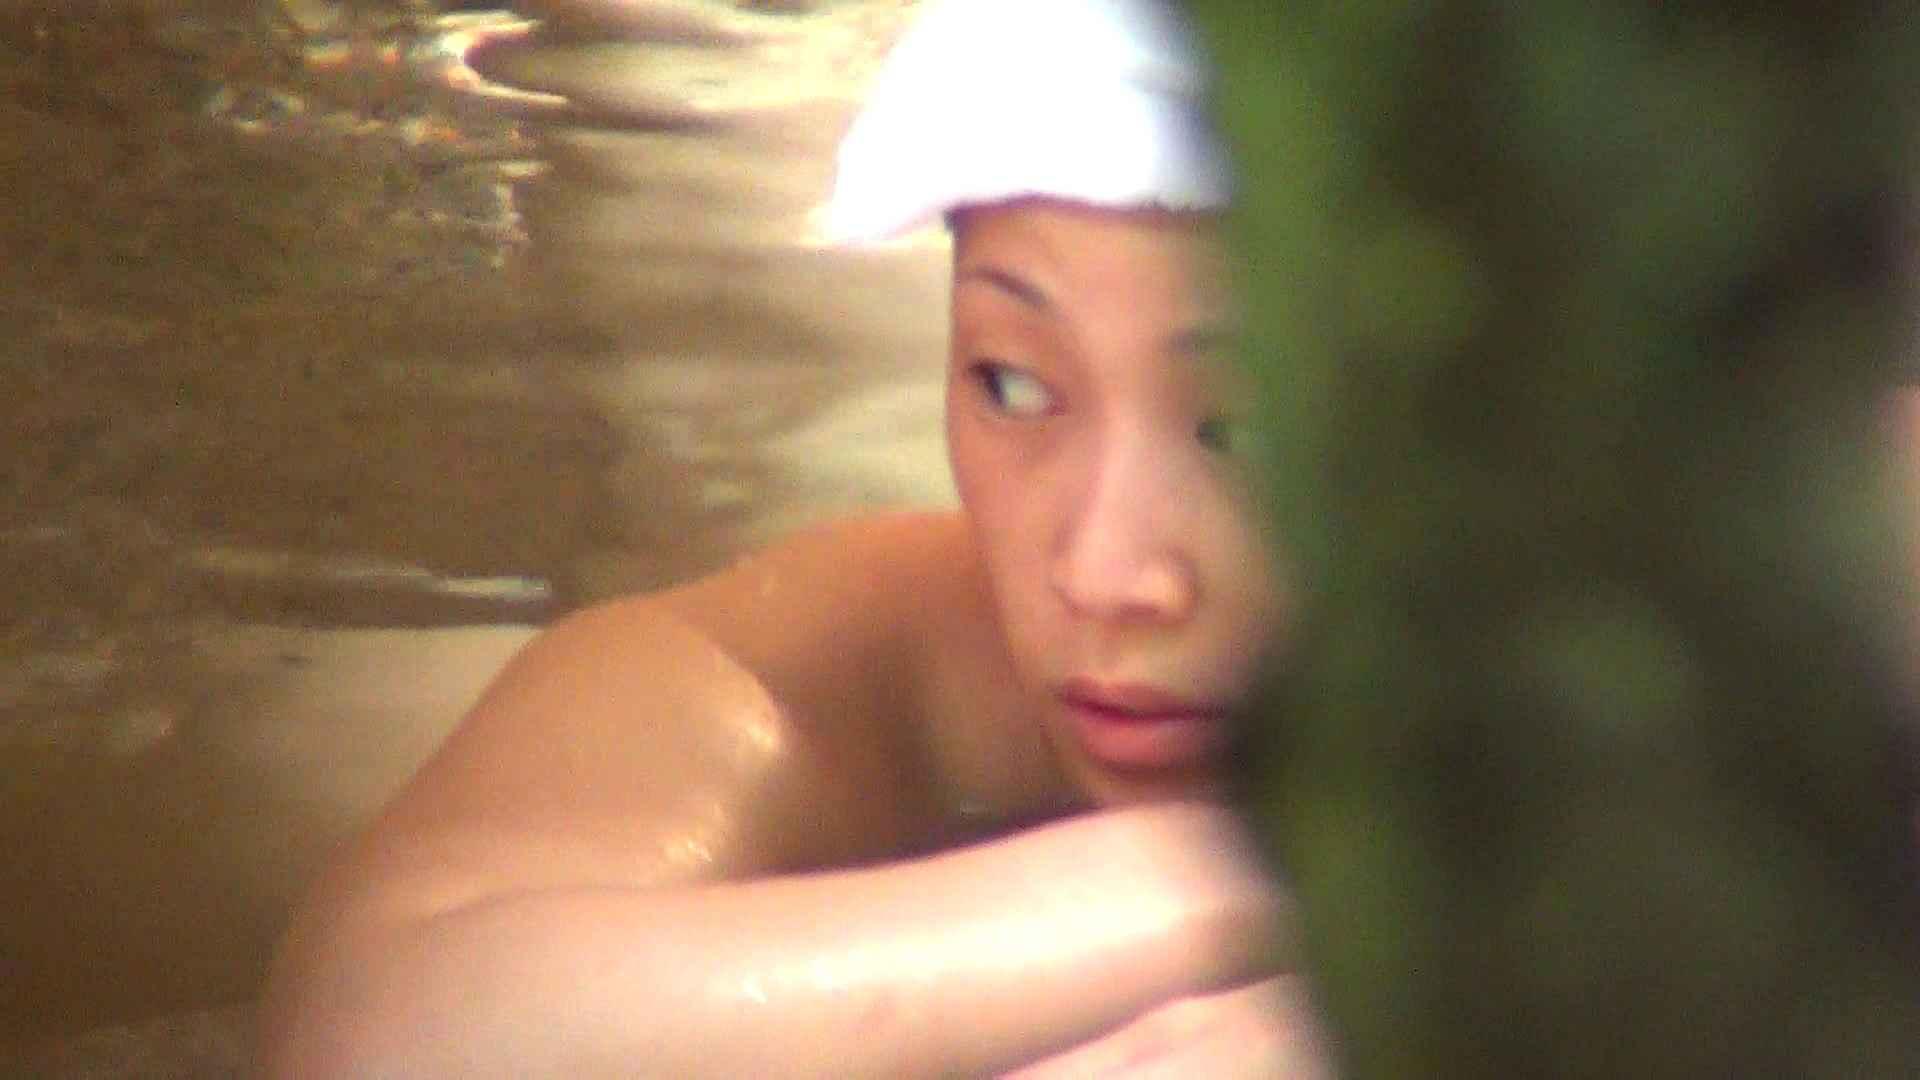 Vol.51 醤油j顔のお女市さん 胸の割りに下半身はがっちりタイプ 美女 ワレメ動画紹介 79画像 28